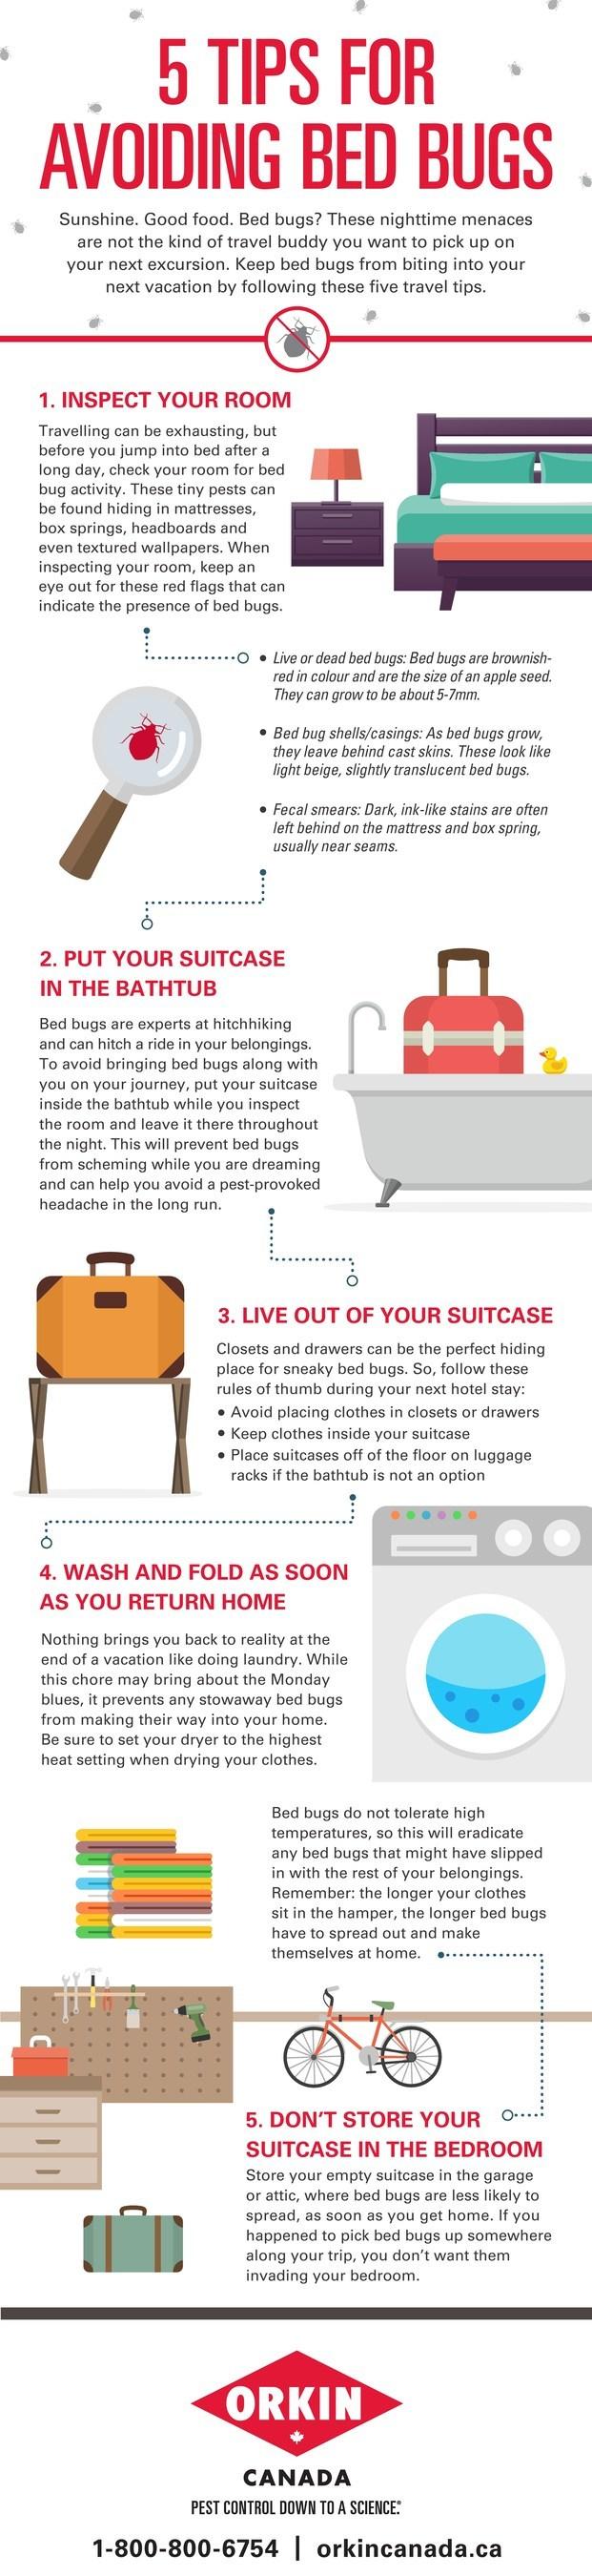 Avoiding Bed Bugs (CNW Group/Orkin Canada)